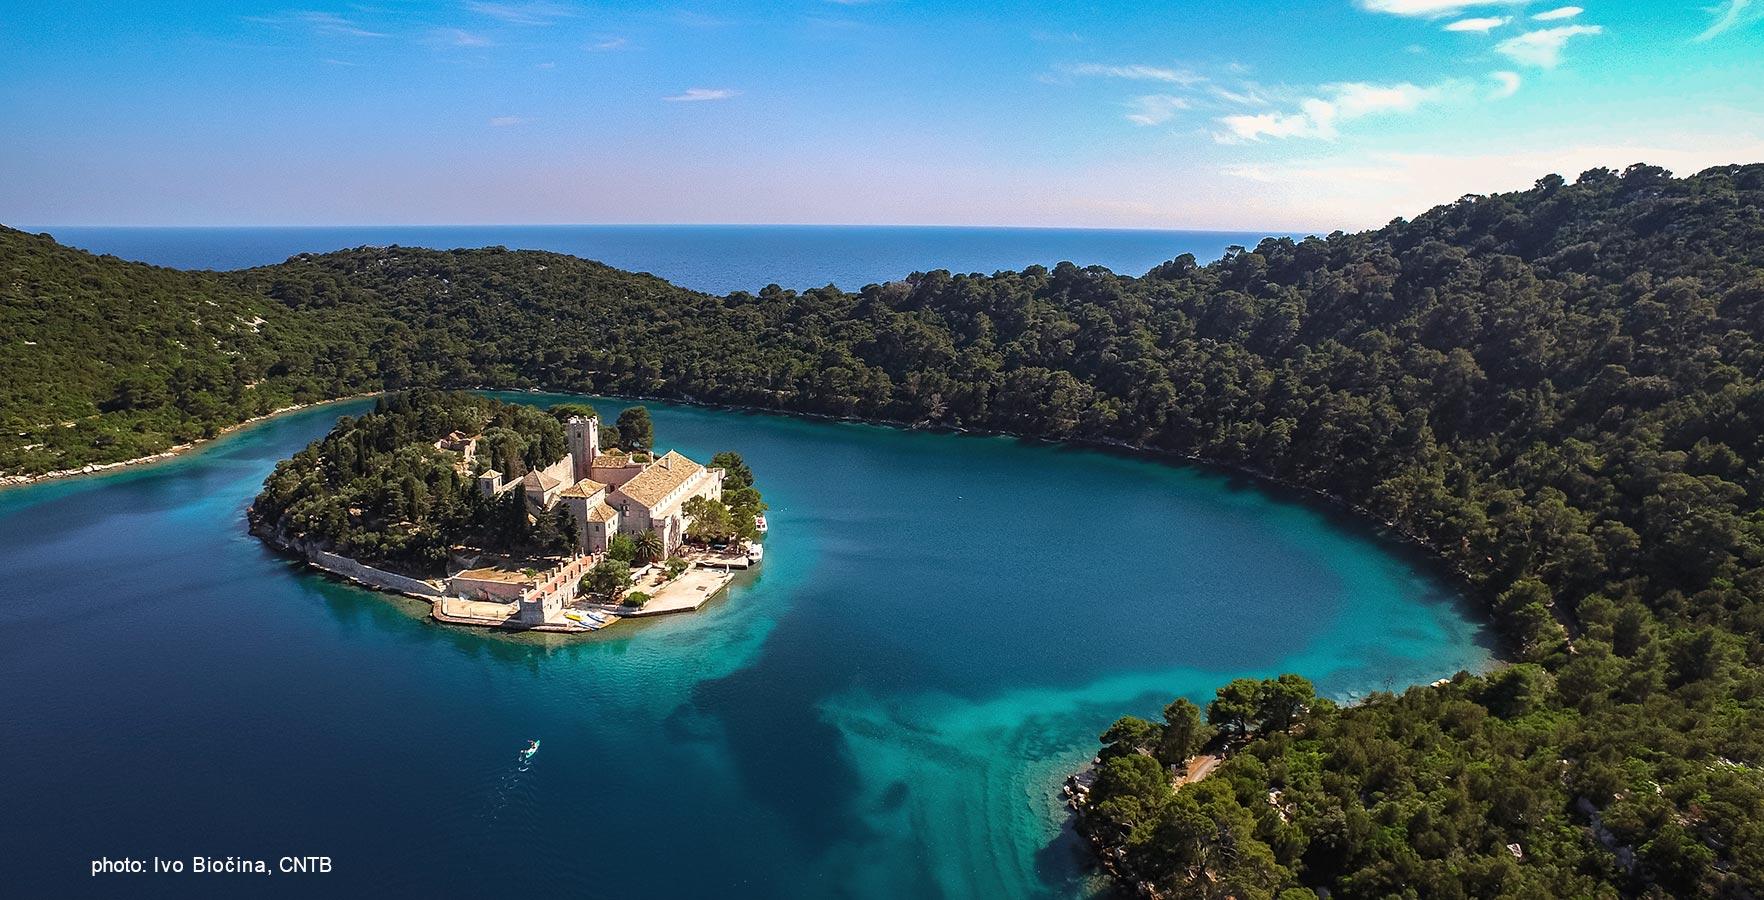 kroatiens natursch u00f6nheiten